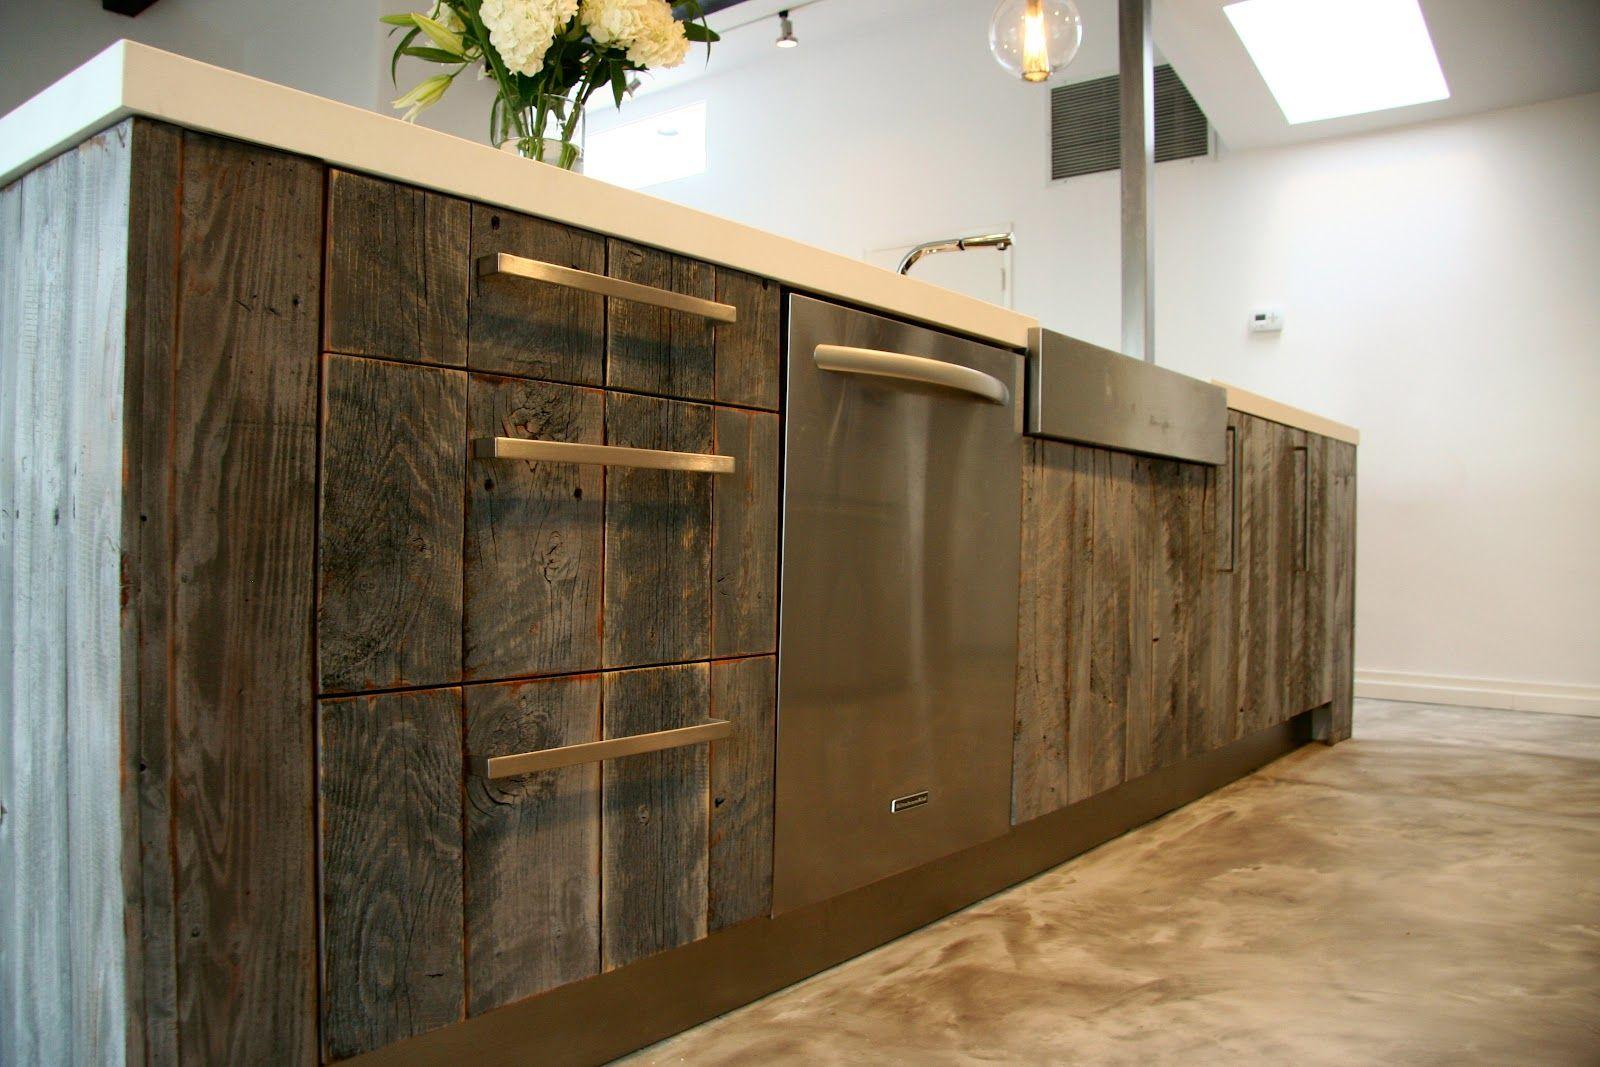 Semihandmade Reclaimed Lumber Kitchen Reclaimed Wood Kitchen Reclaimed Kitchen Cabinets Reclaimed Kitchen